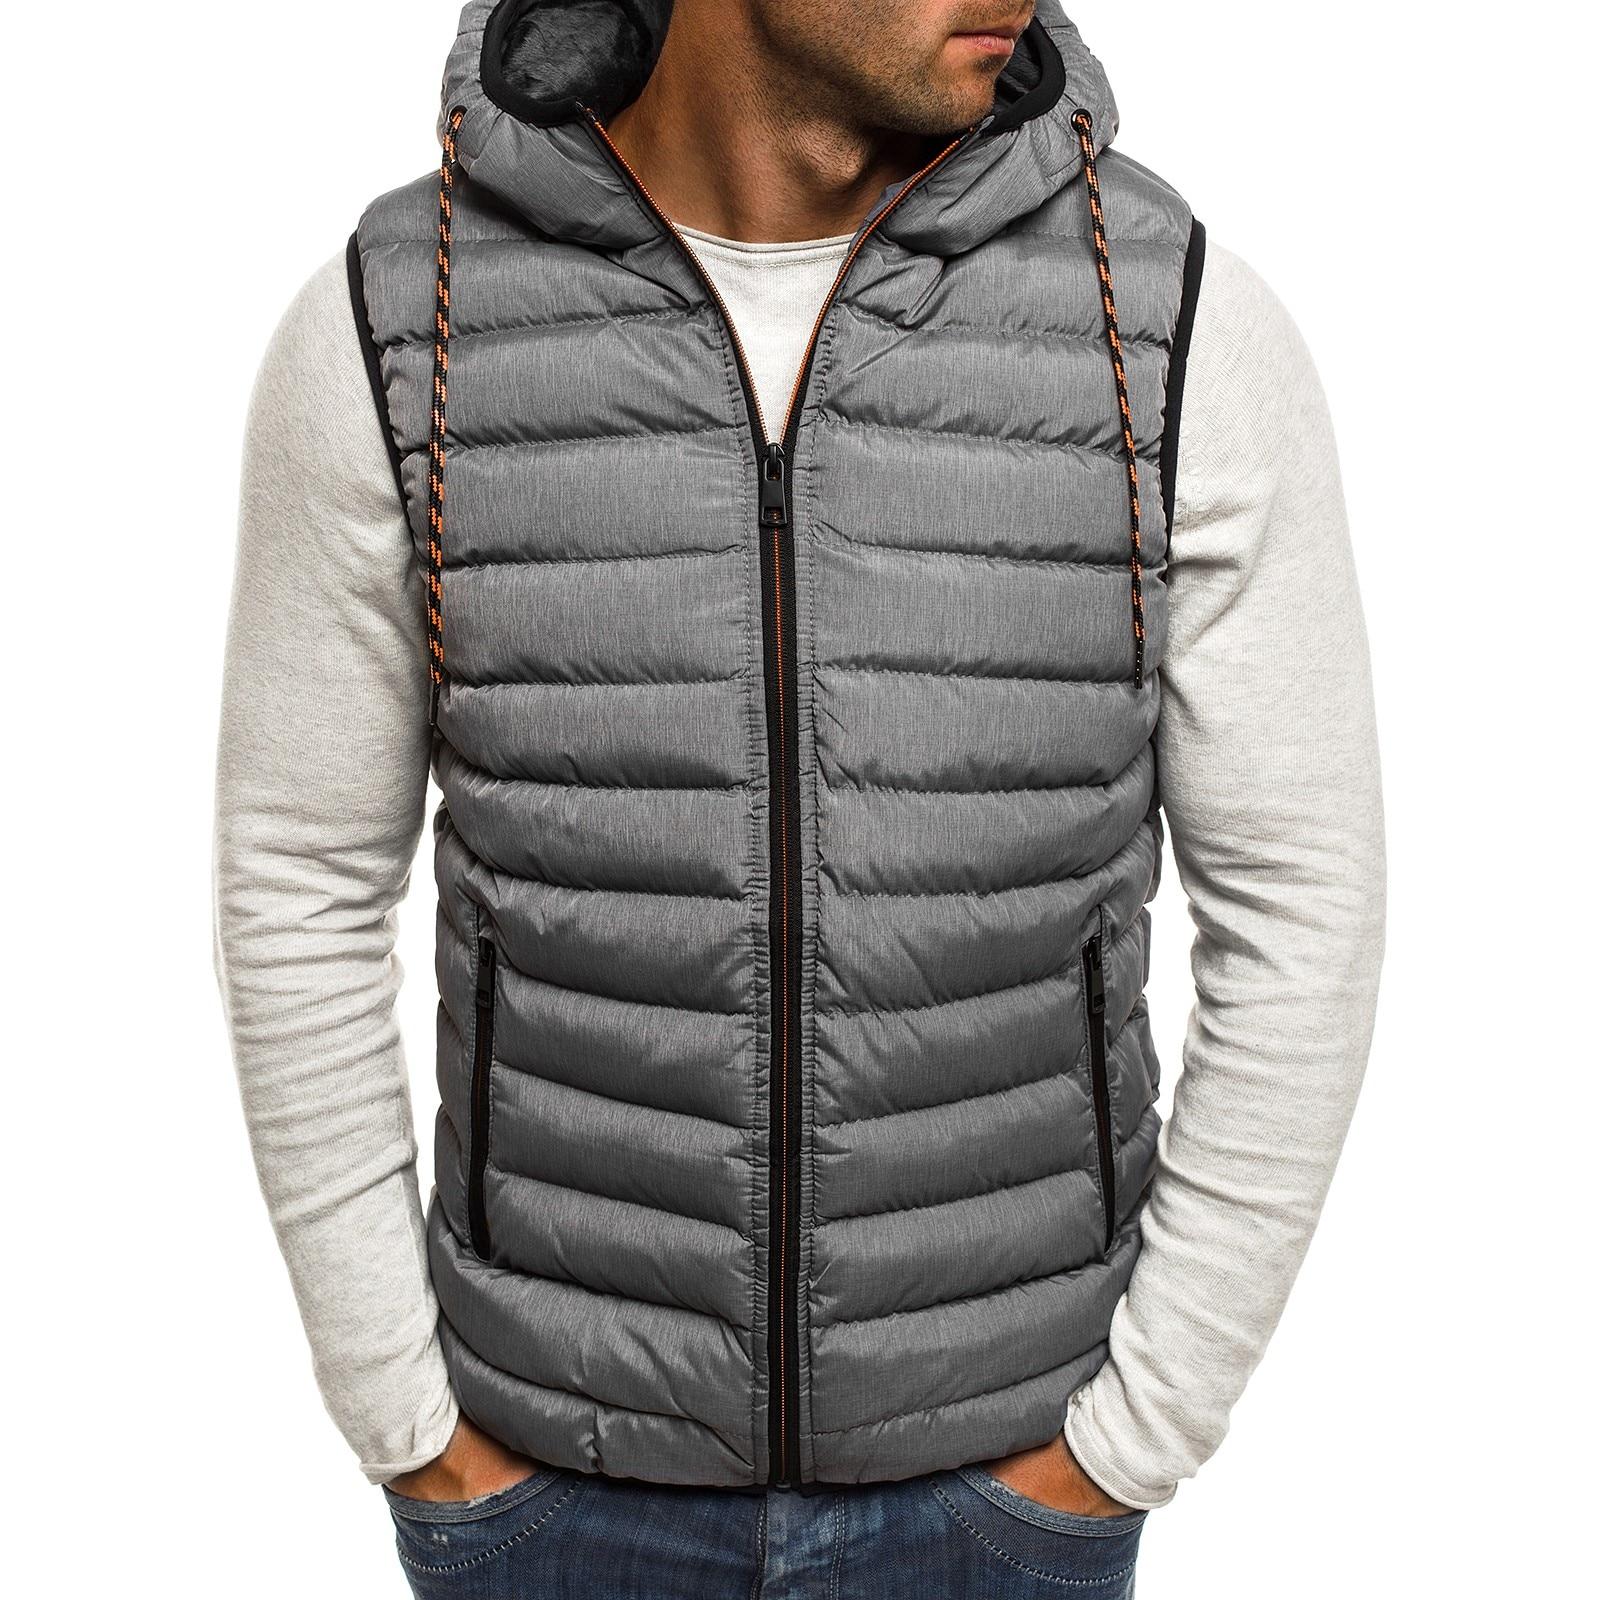 ZOGAA New Men Winter Jacket New Casual Fashion Hood Mens Winter Vests  Winter Vest Plus Size M-4XL Mens Lightweight Jacket 2019